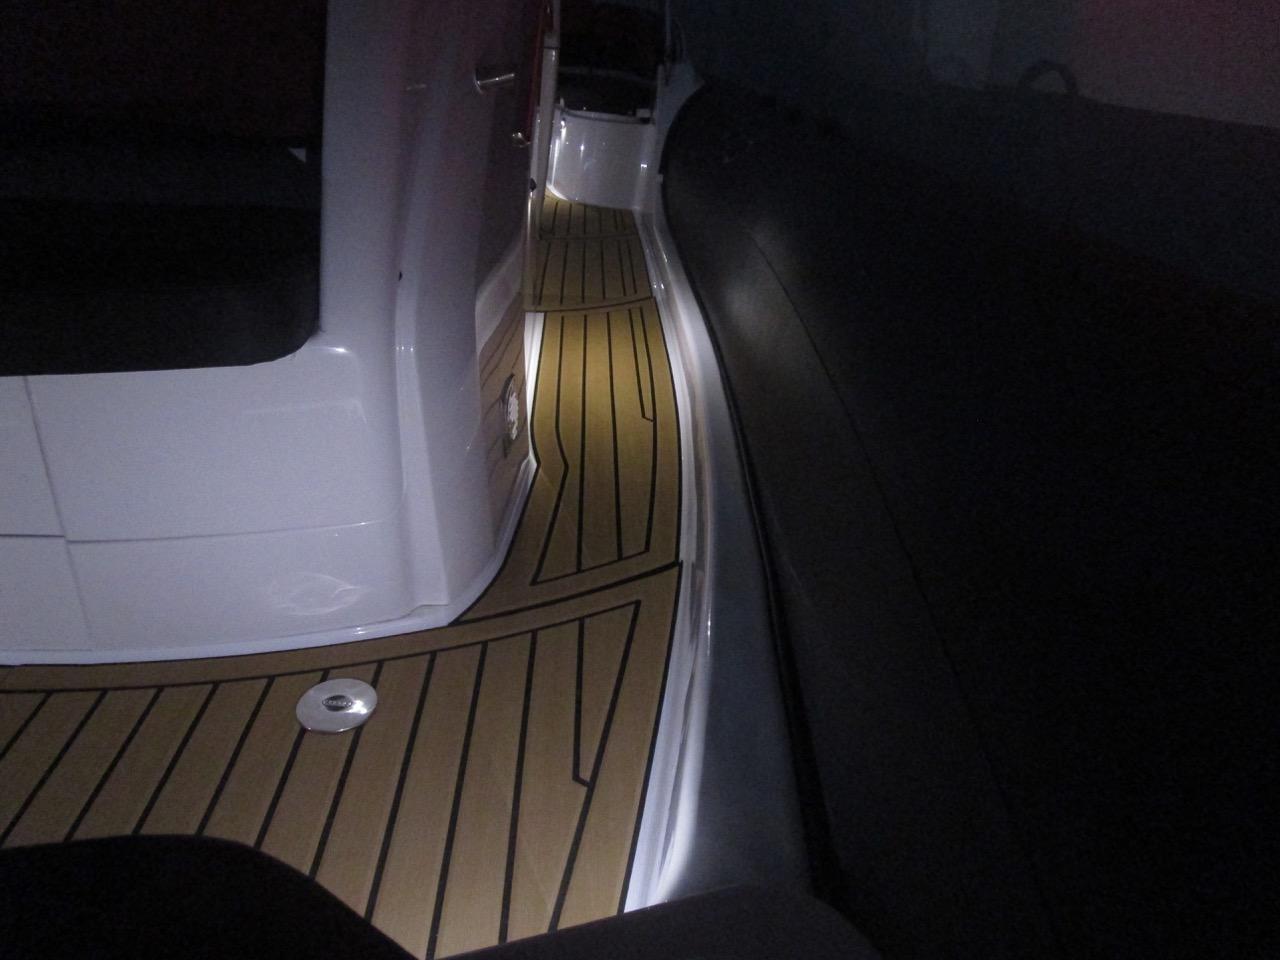 GRAND G850 RIB LED deck lights, port side deck